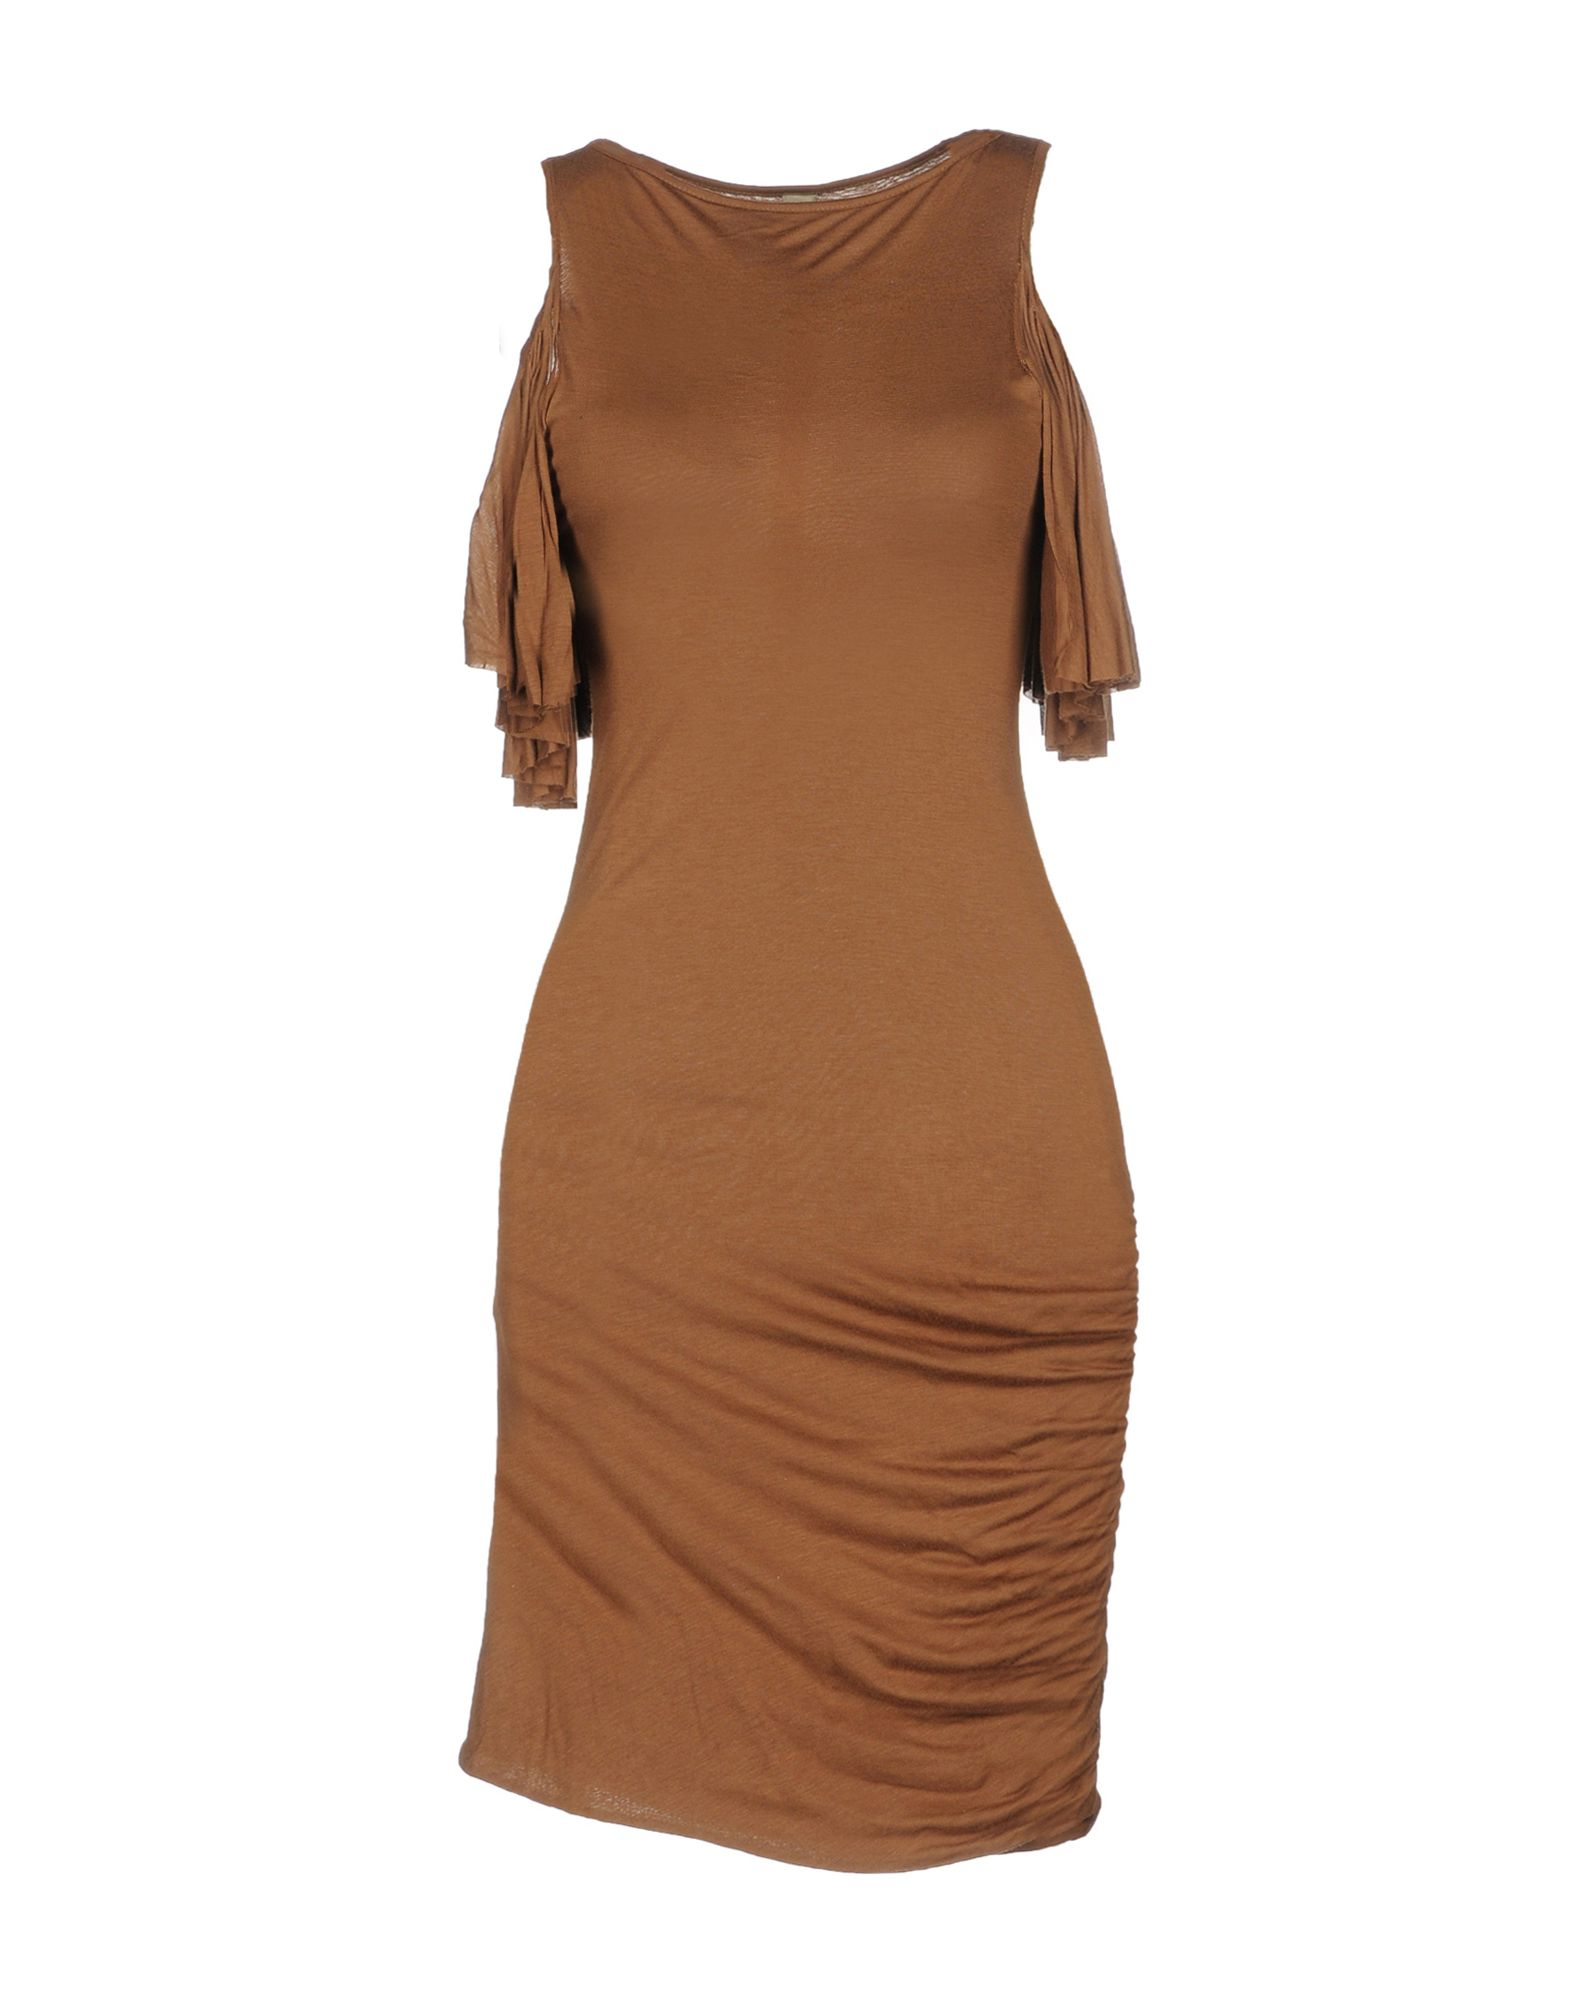 LE COEUR de TWIN-SET SIMONA BARBIERI Платье до колена колье coeur de lion 4838 10 1500